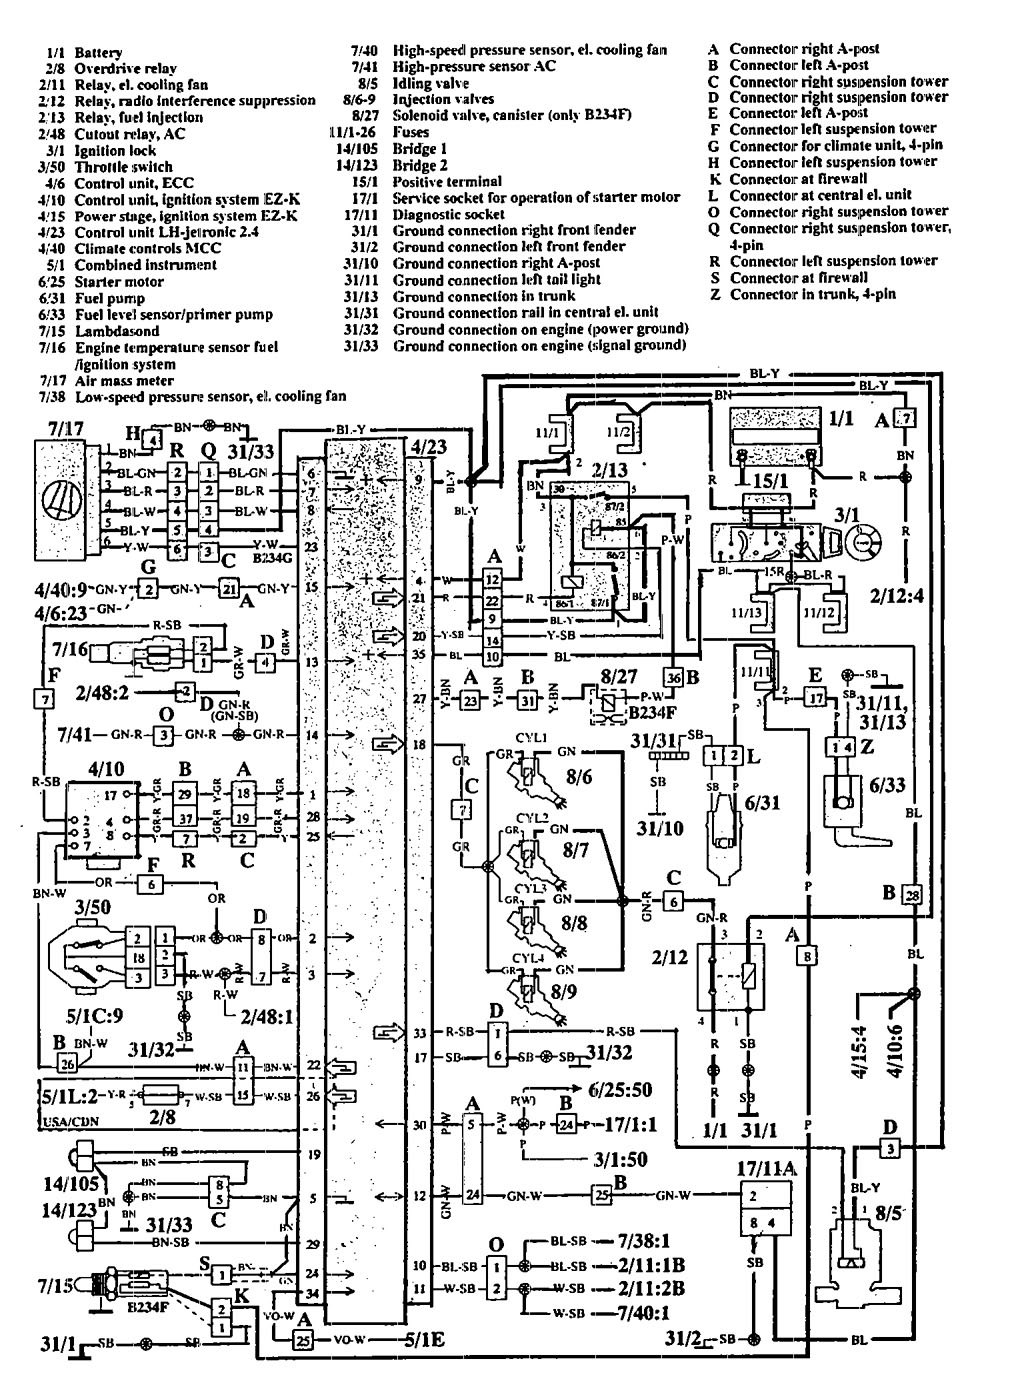 1996 Volvo 850 Radio Wiring Diagram